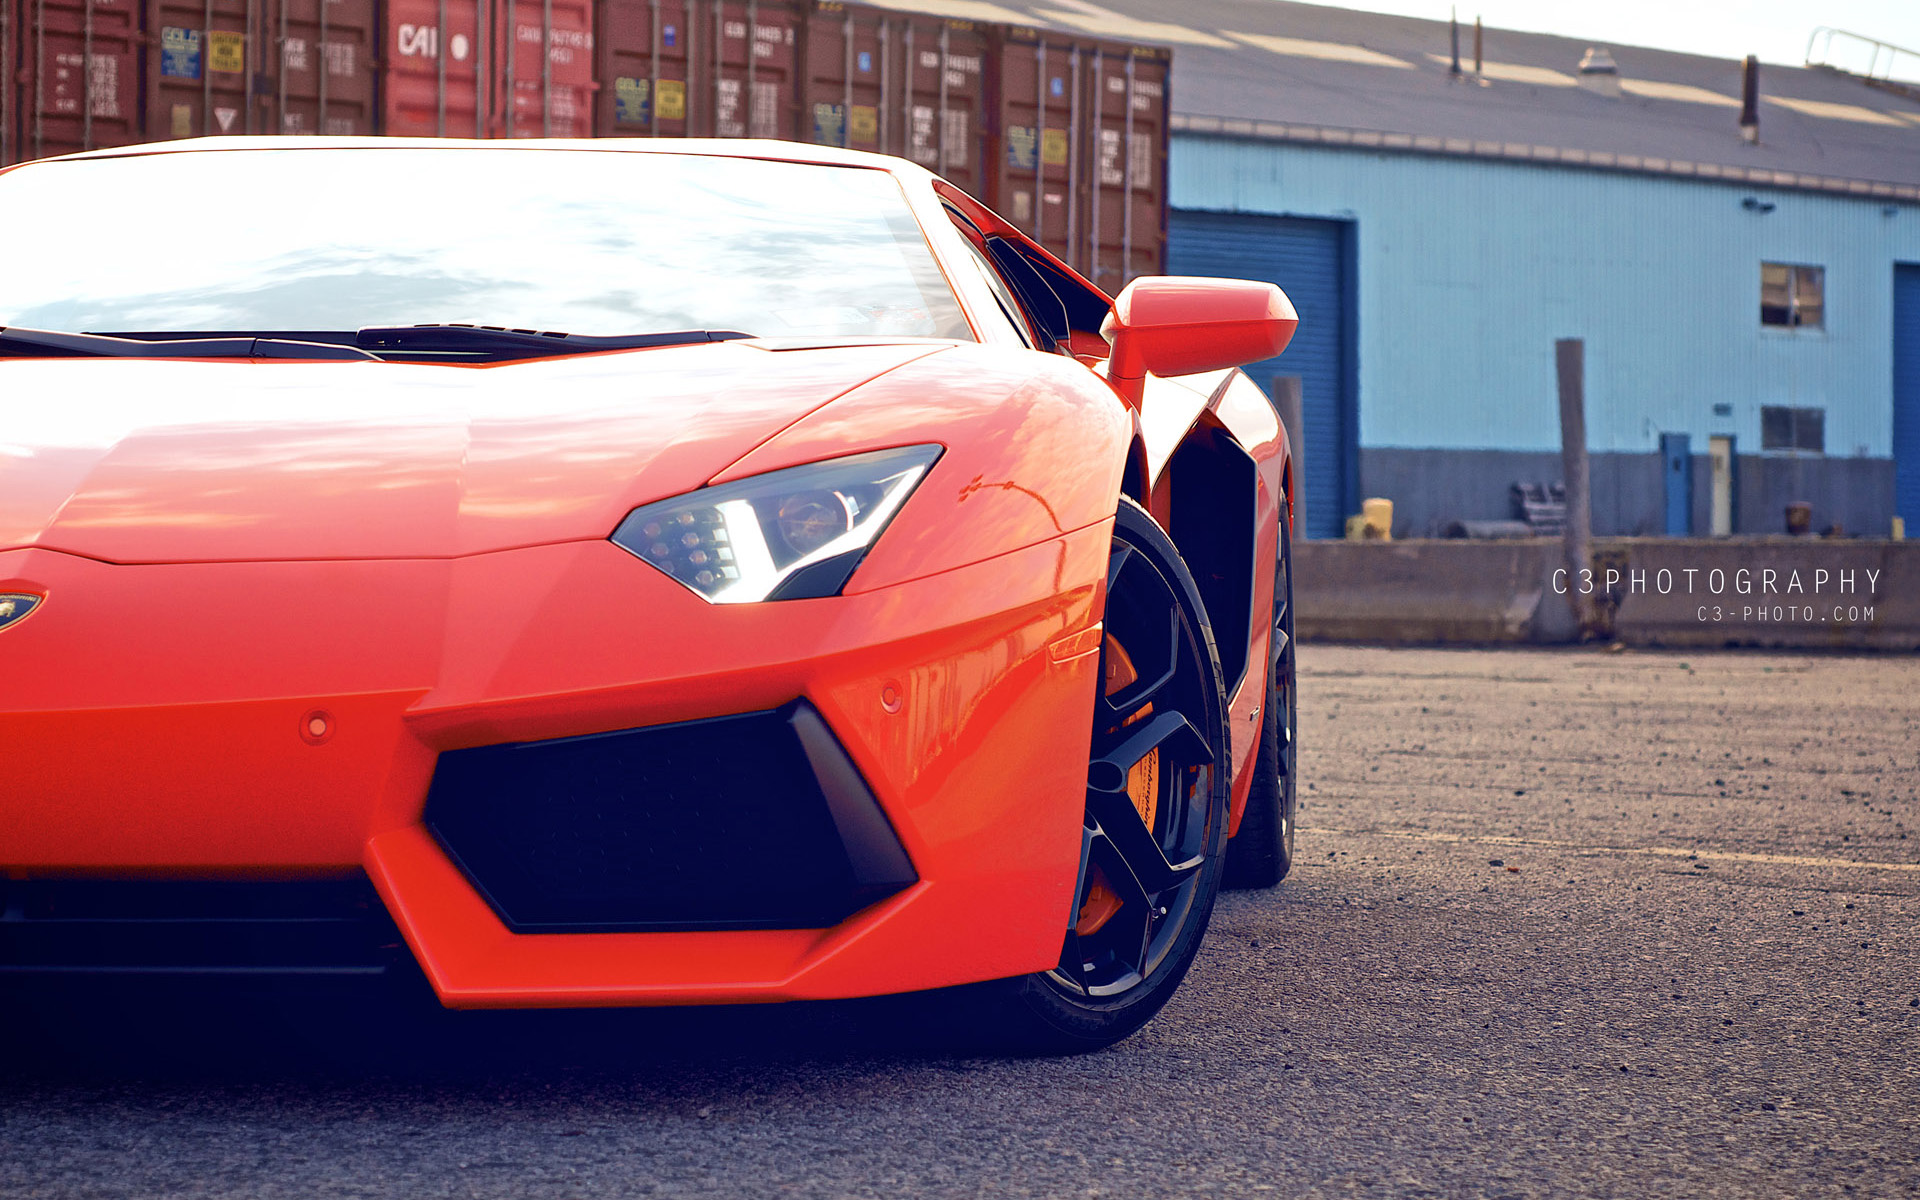 Bentley Car Wallpaper >> Lamborghini Aventador C3Photography Wallpaper | HD Car ...